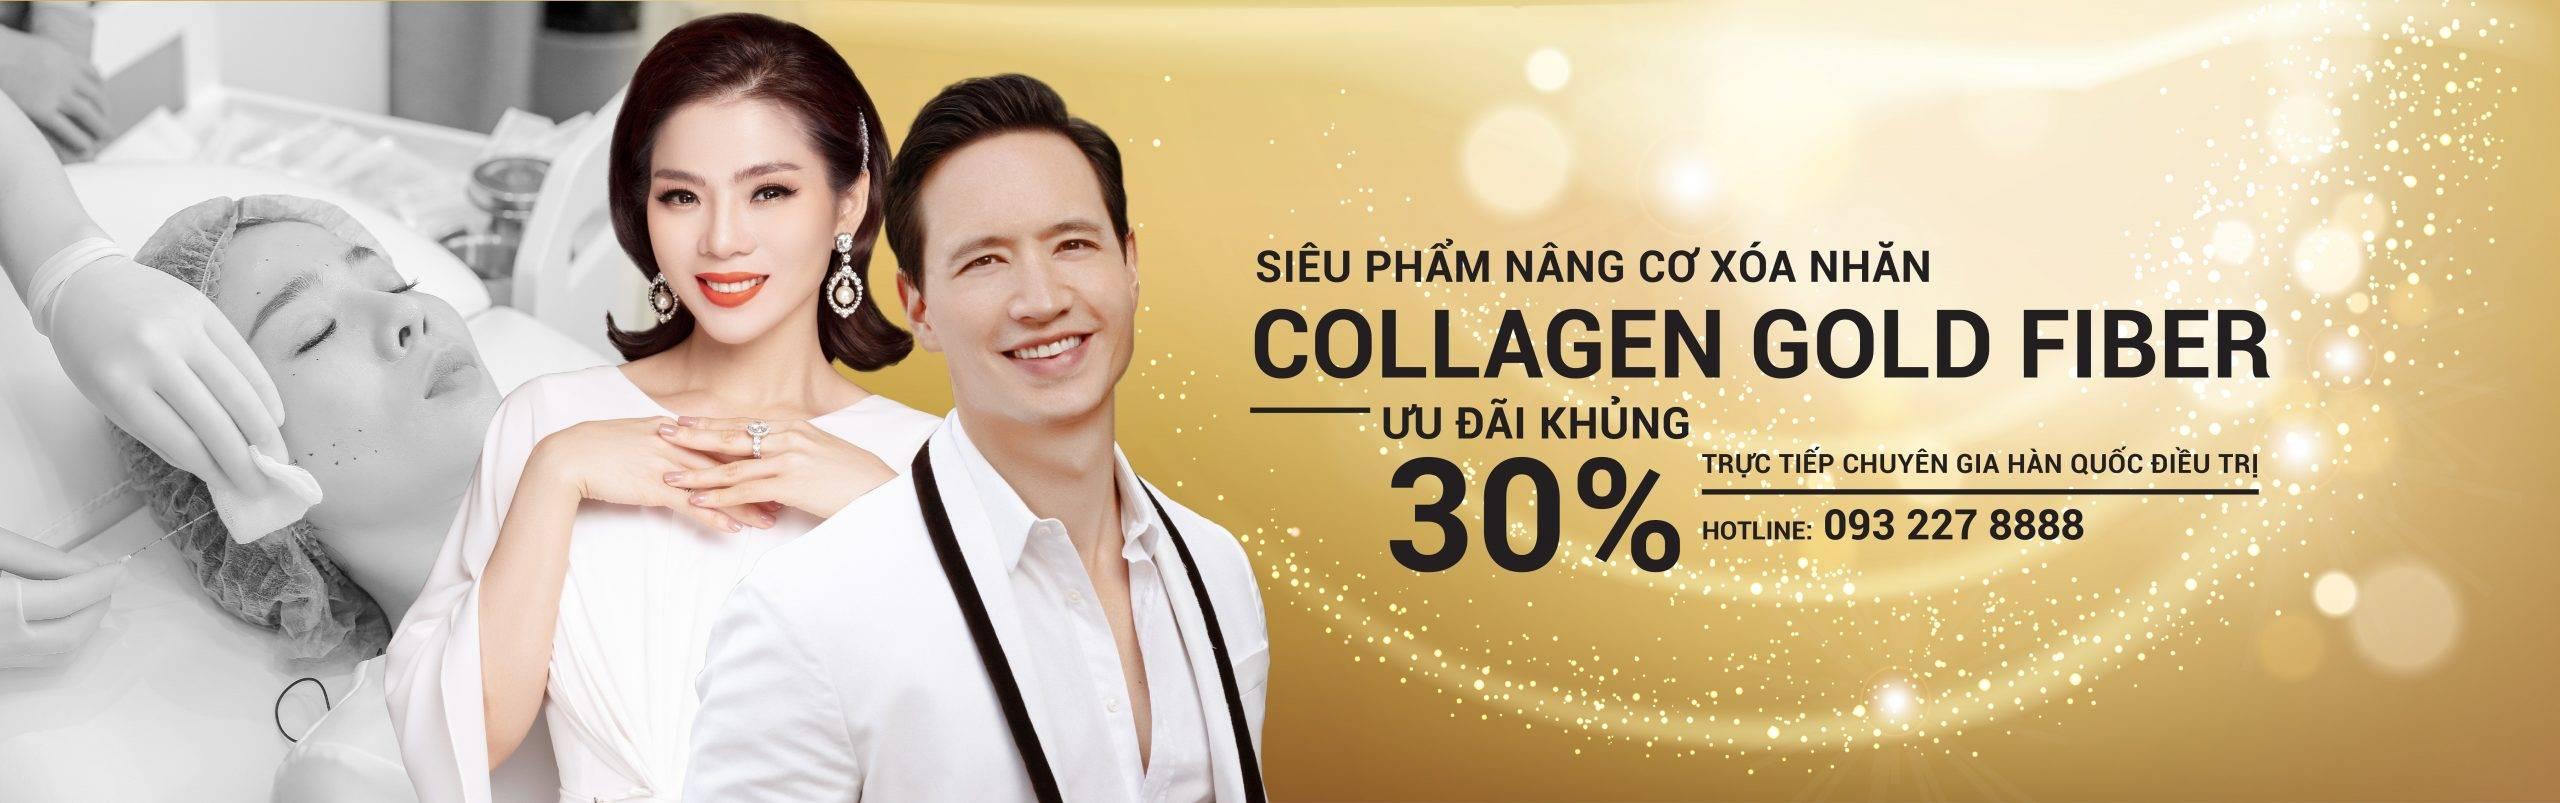 banner-cang-chi-gold-fiber-1